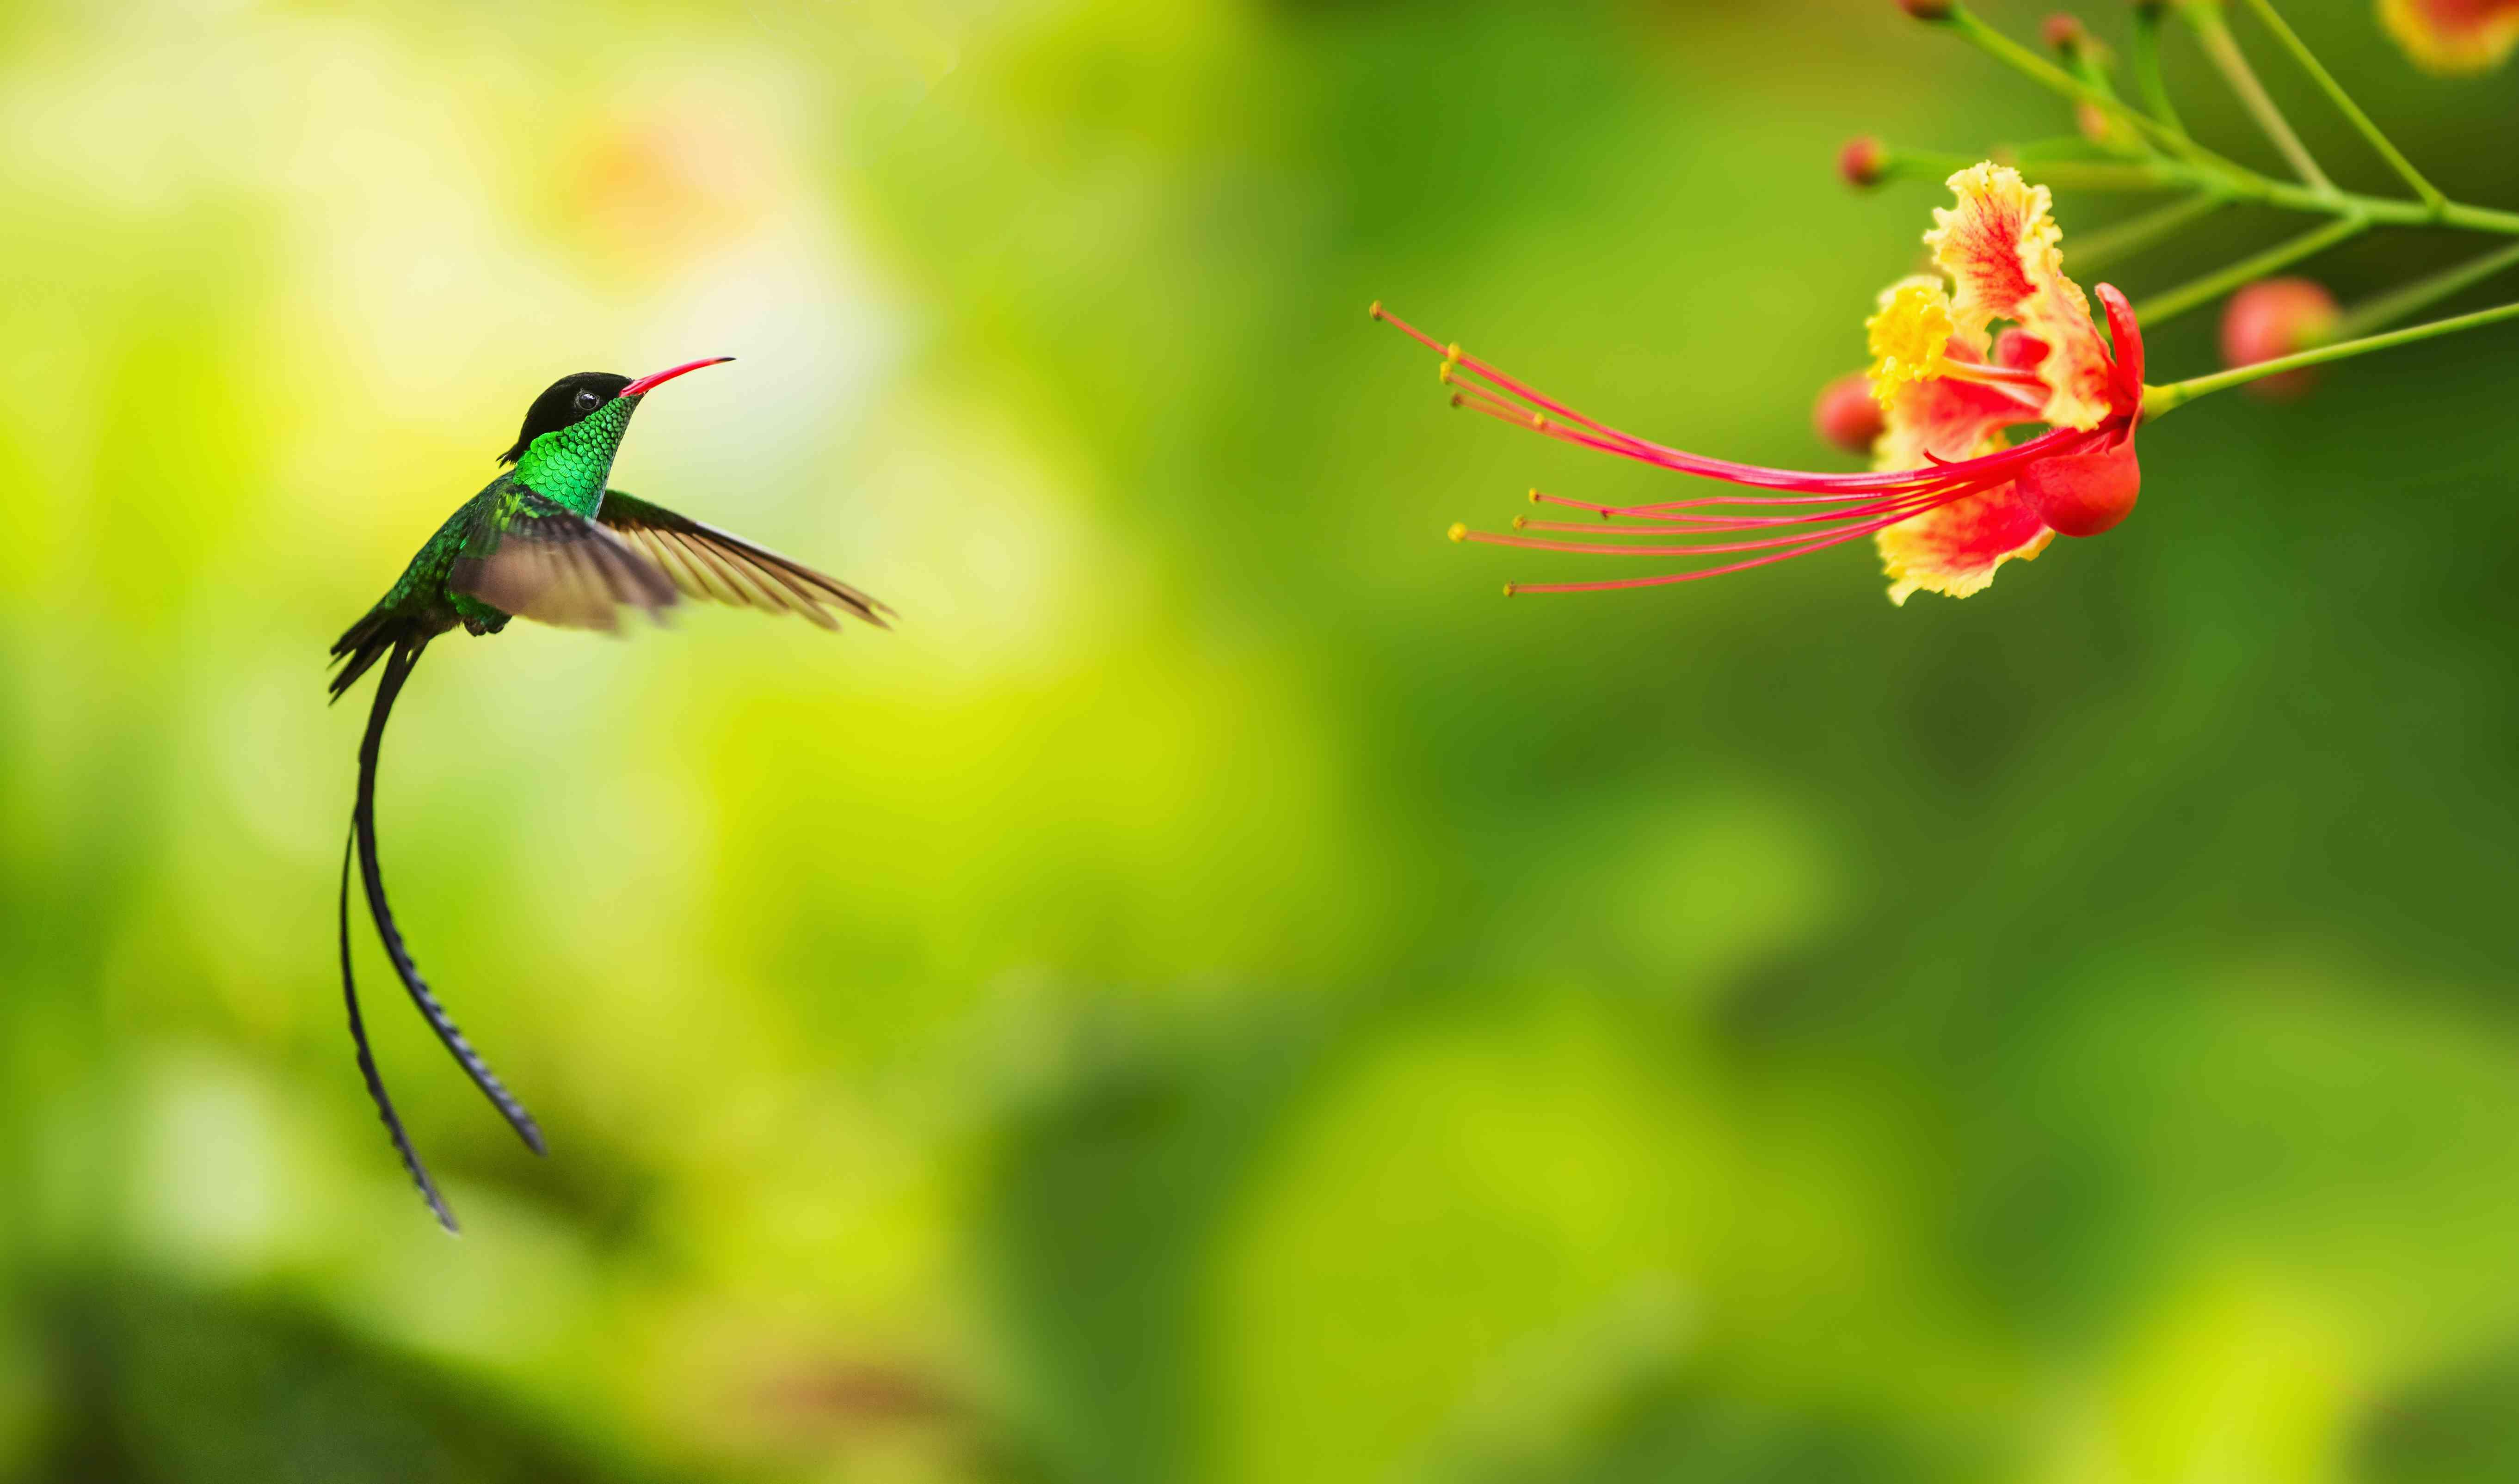 Hummingbird in flight in Jamaica